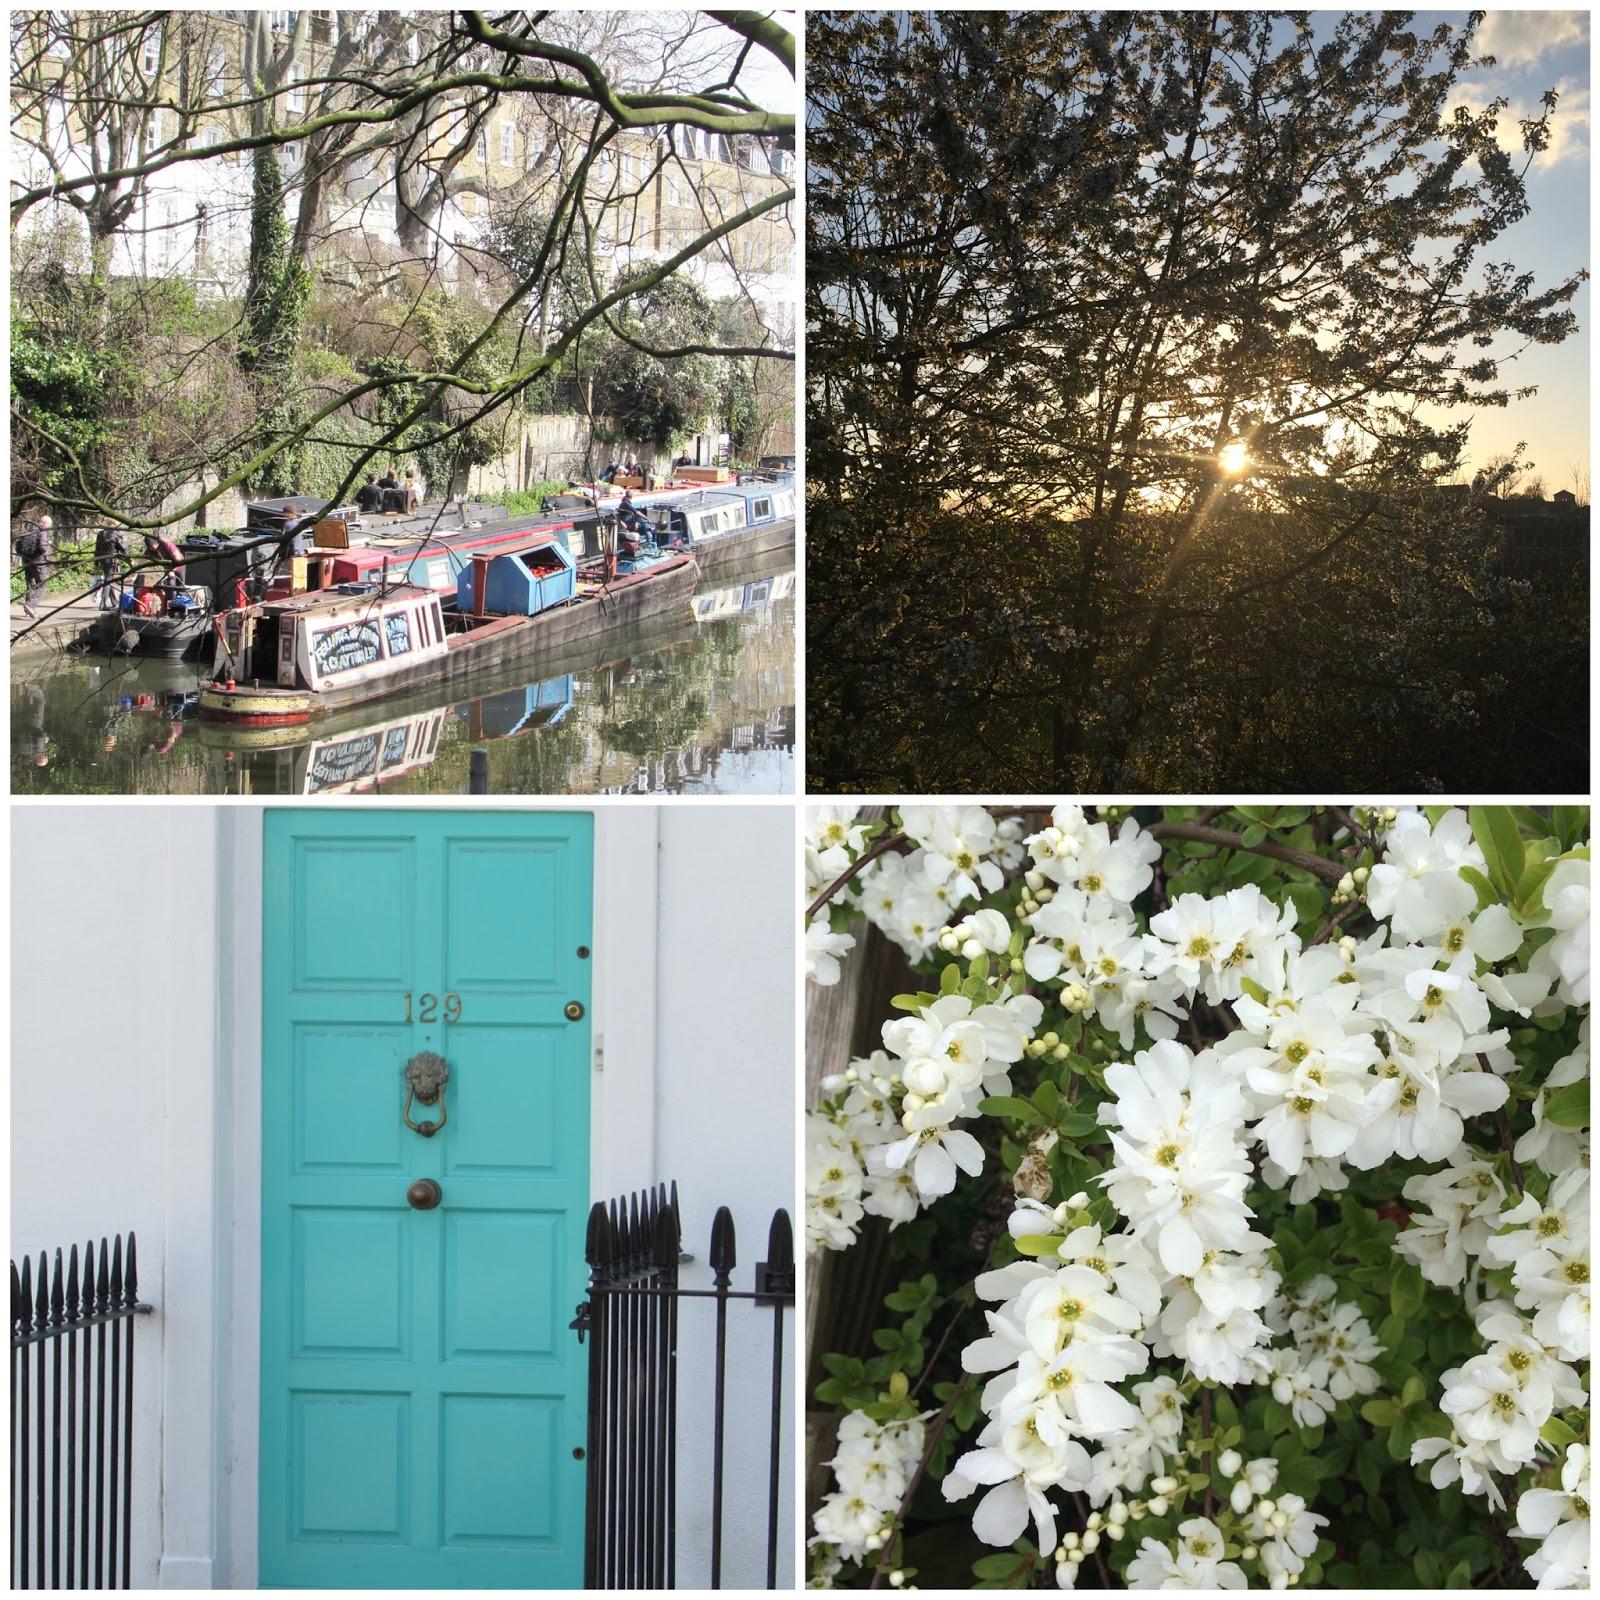 April recap in photos